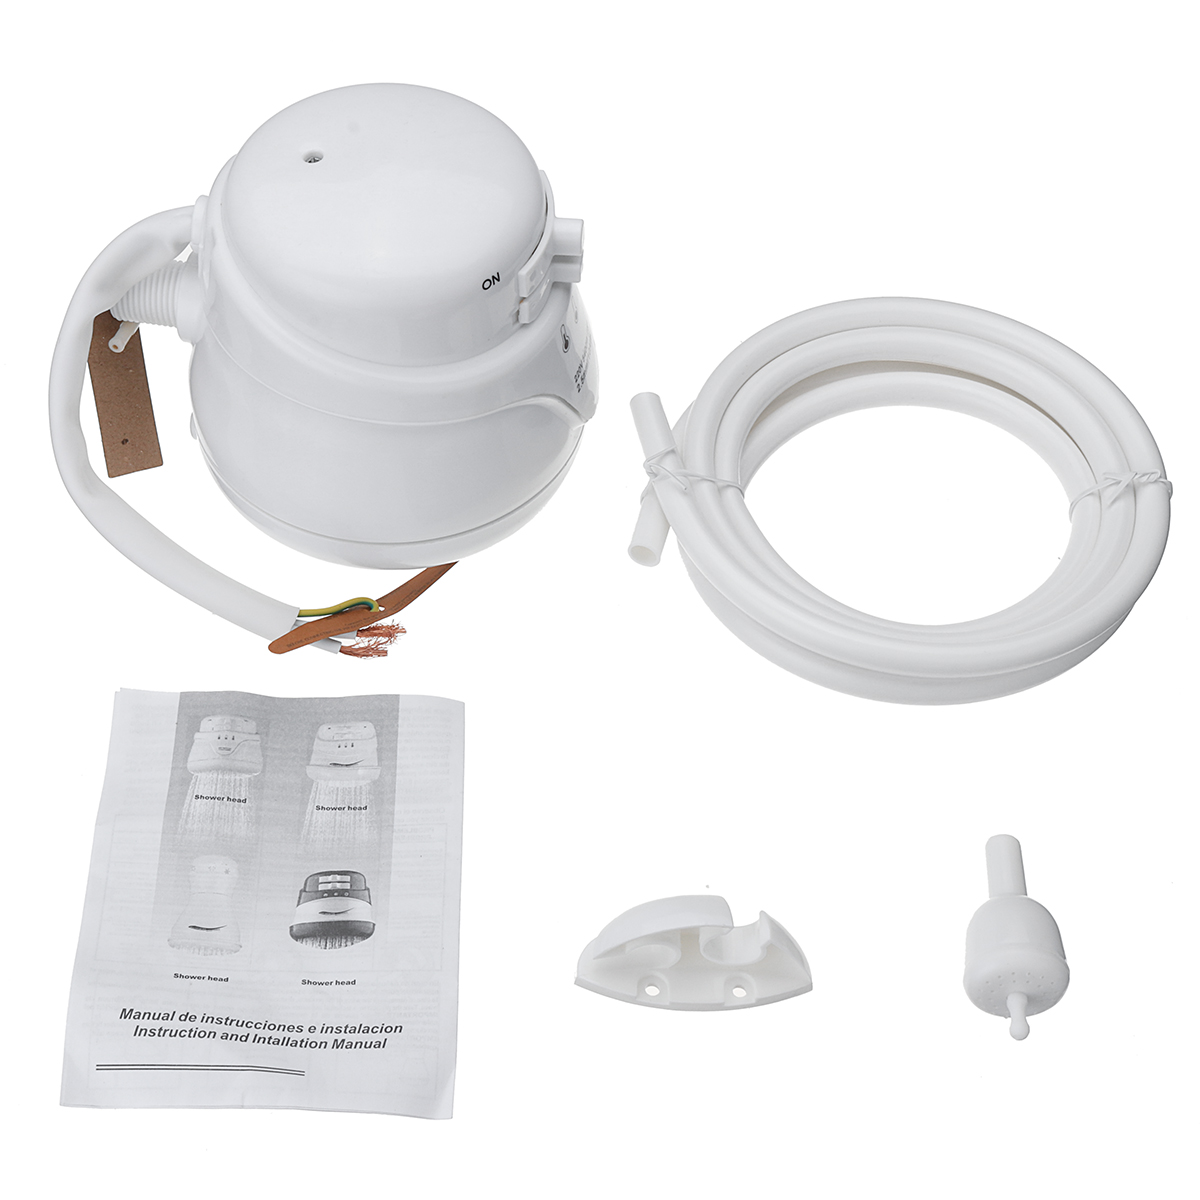 Other Gadgets 110v 220v 5400w Electric Shower Head